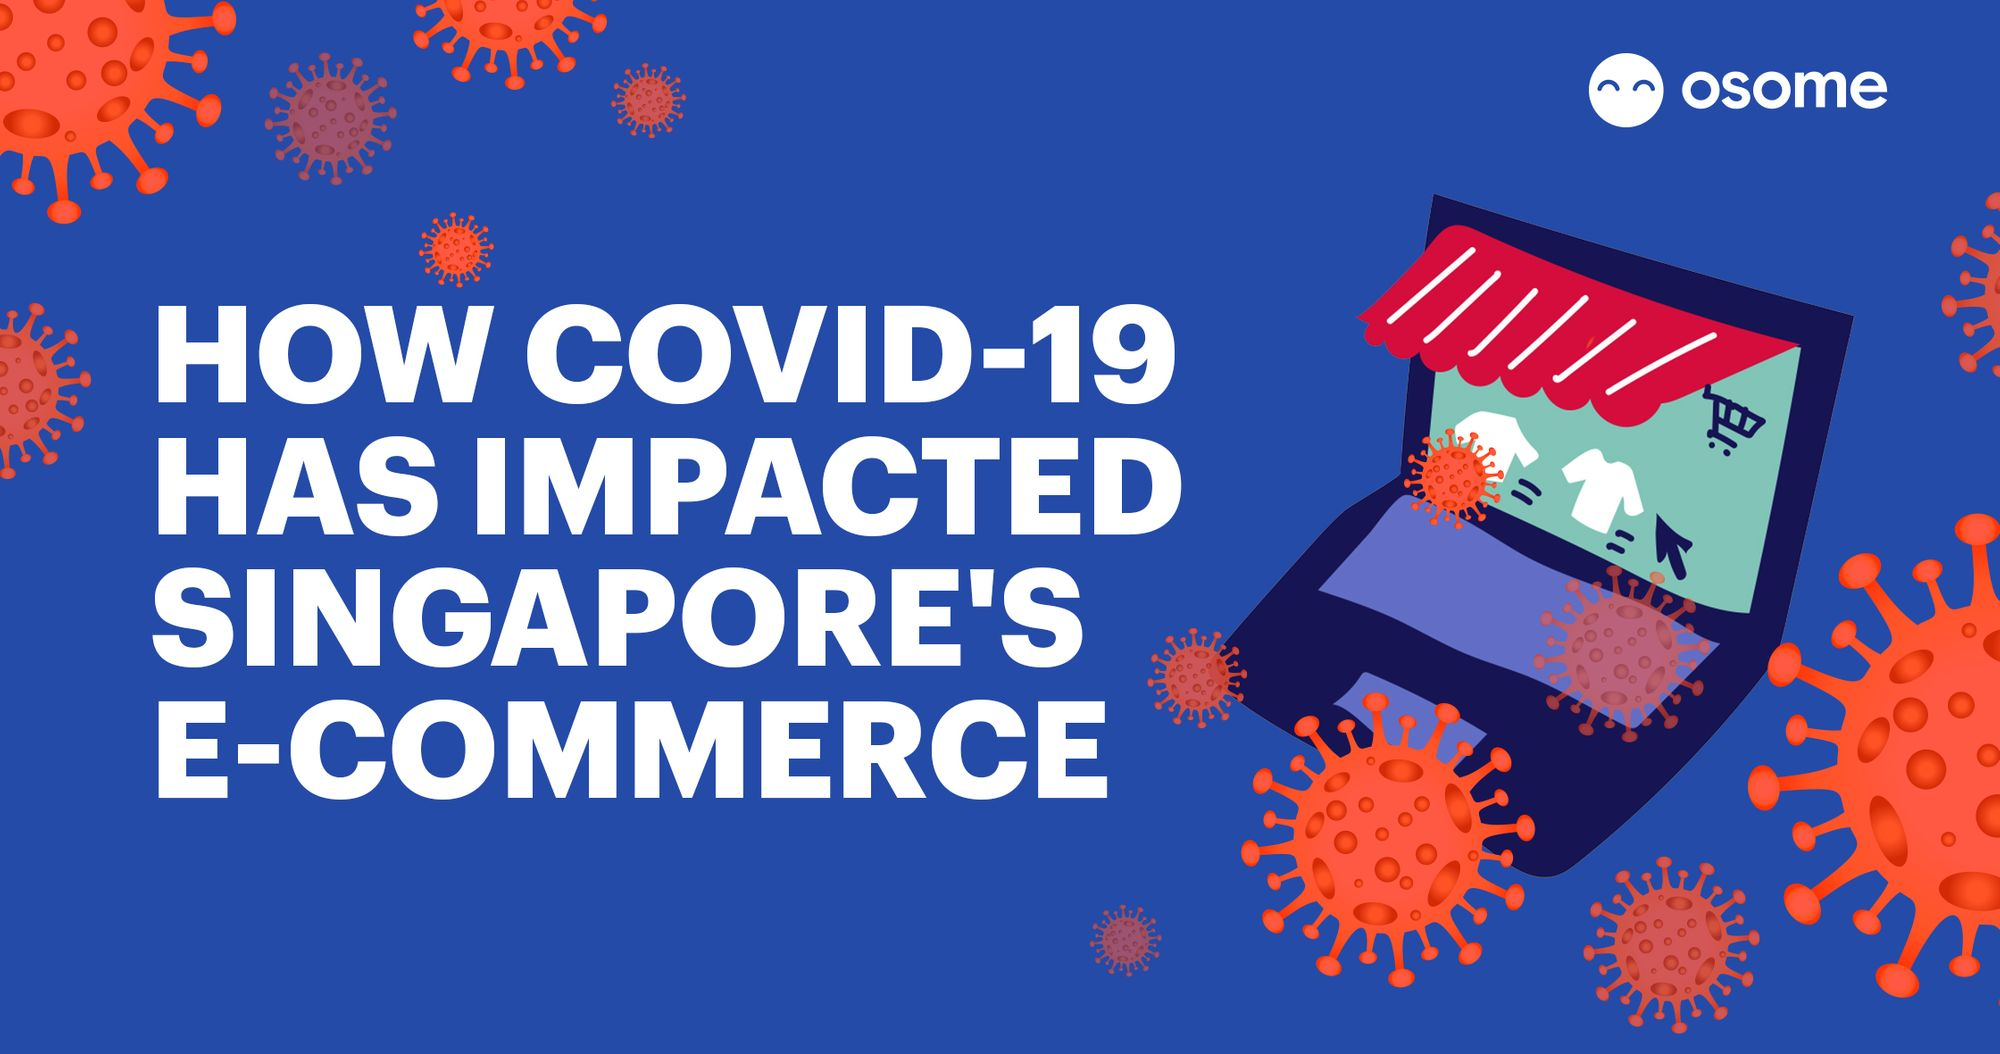 How Covid-19 Has Impacted Singapore's E-commerce